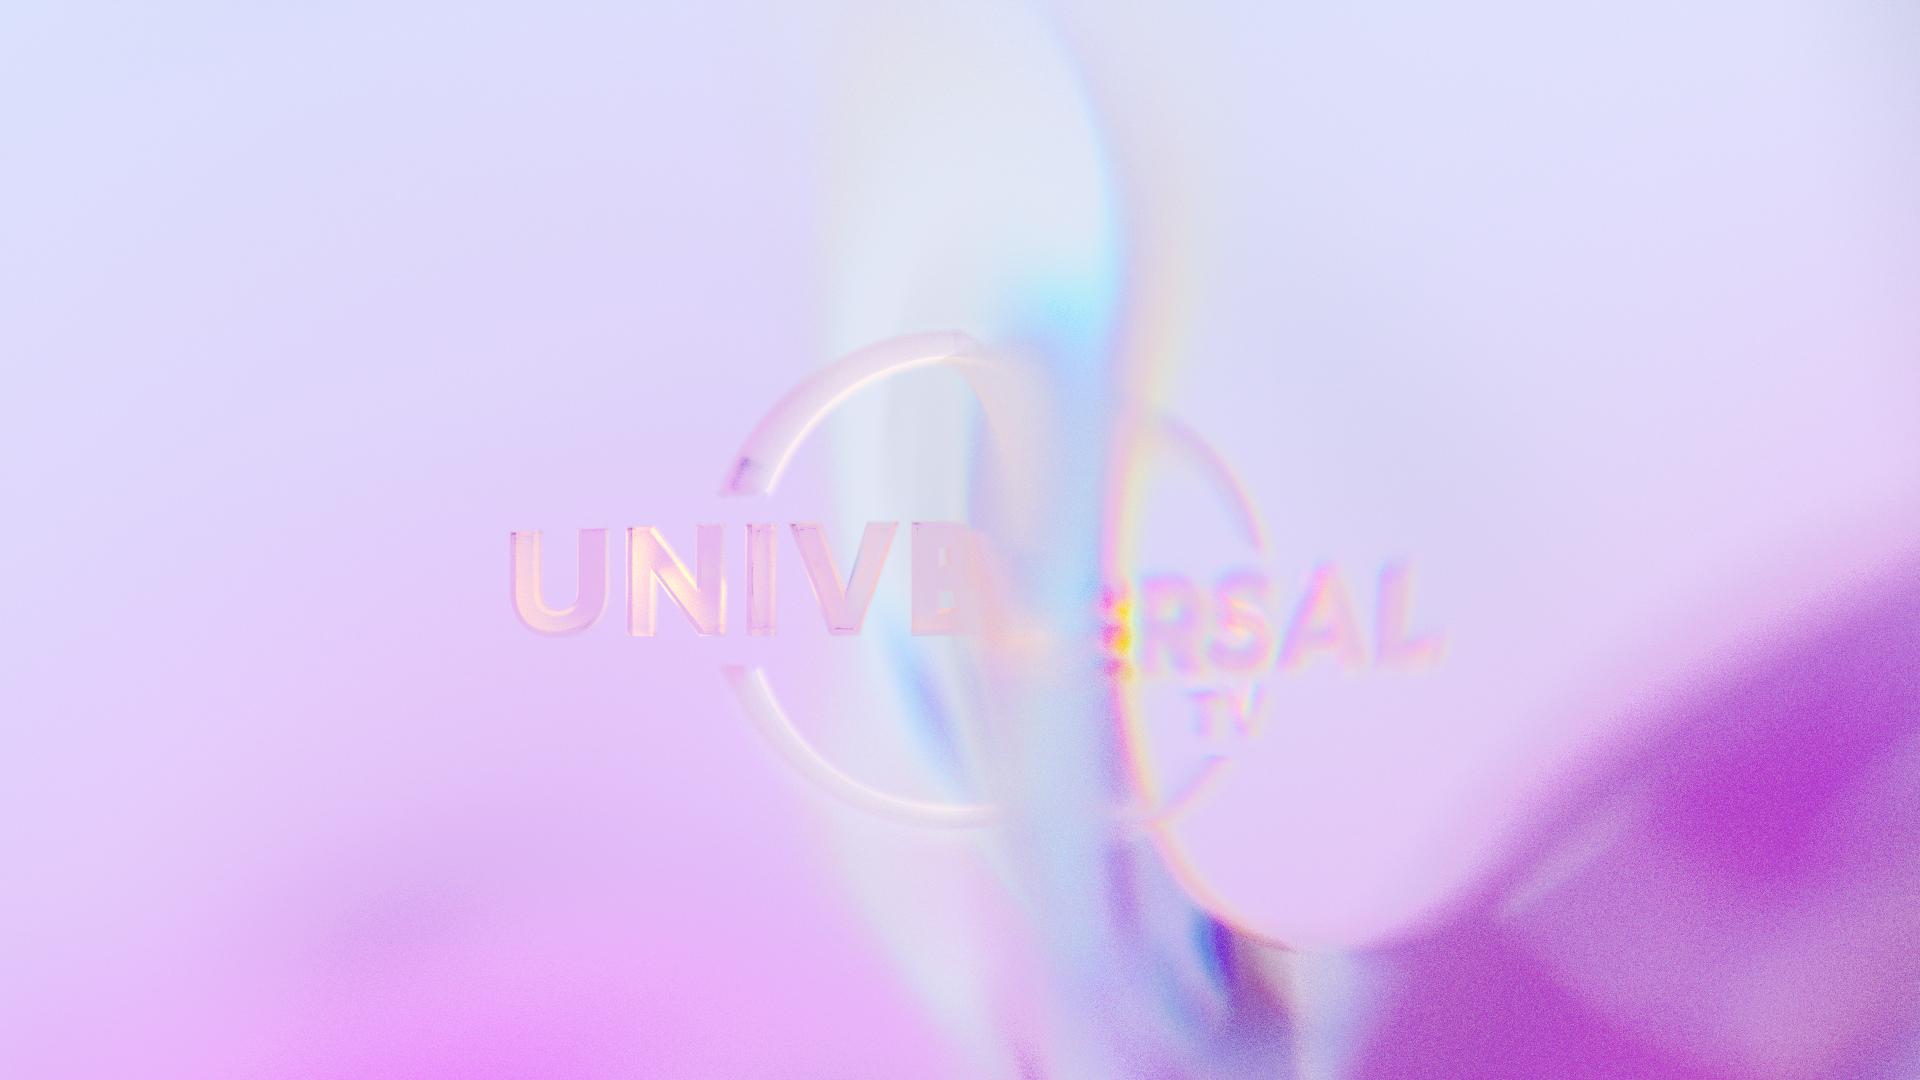 UNIVERSAL_RND_22